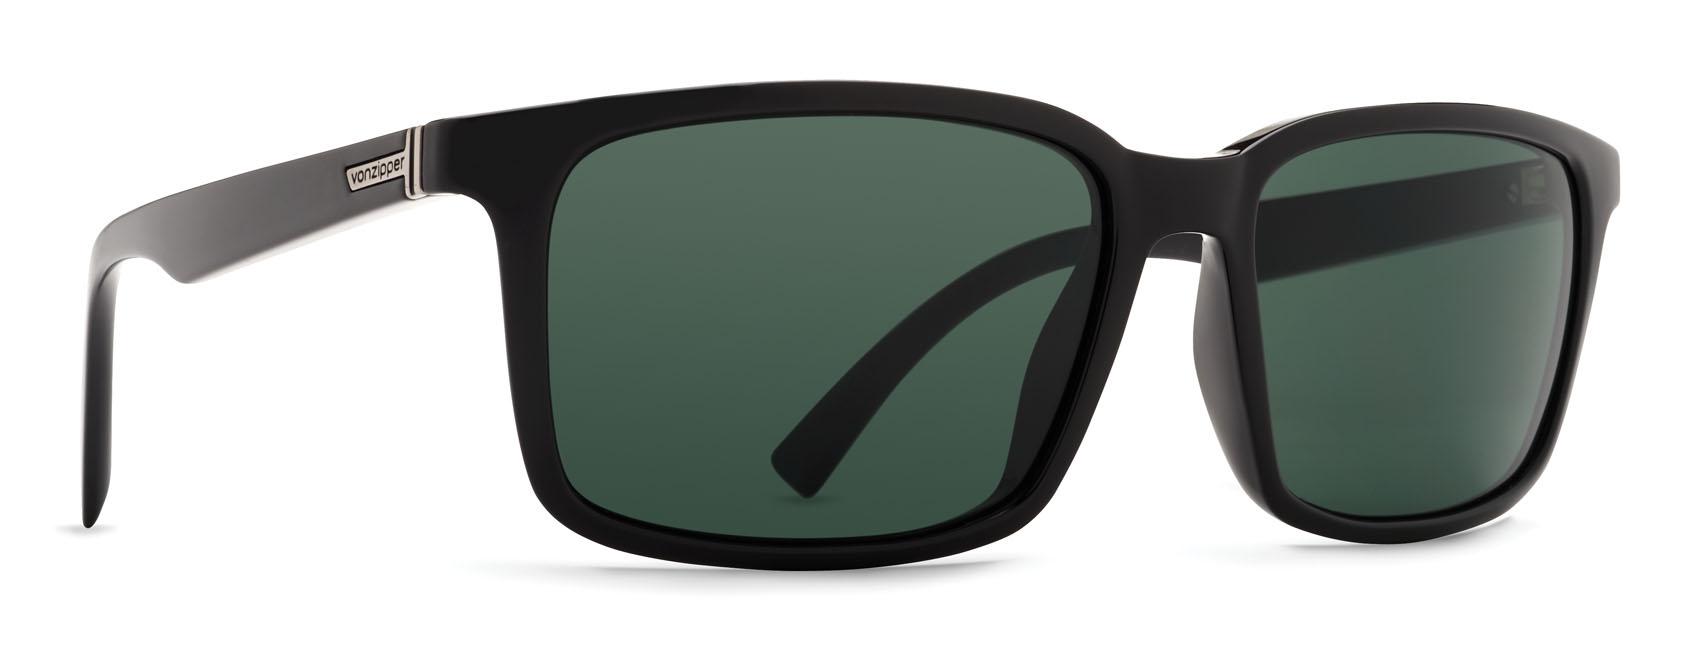 56ca2876f3 VonZipper Pinch Sunglasses Black Gloss Vintage Grey